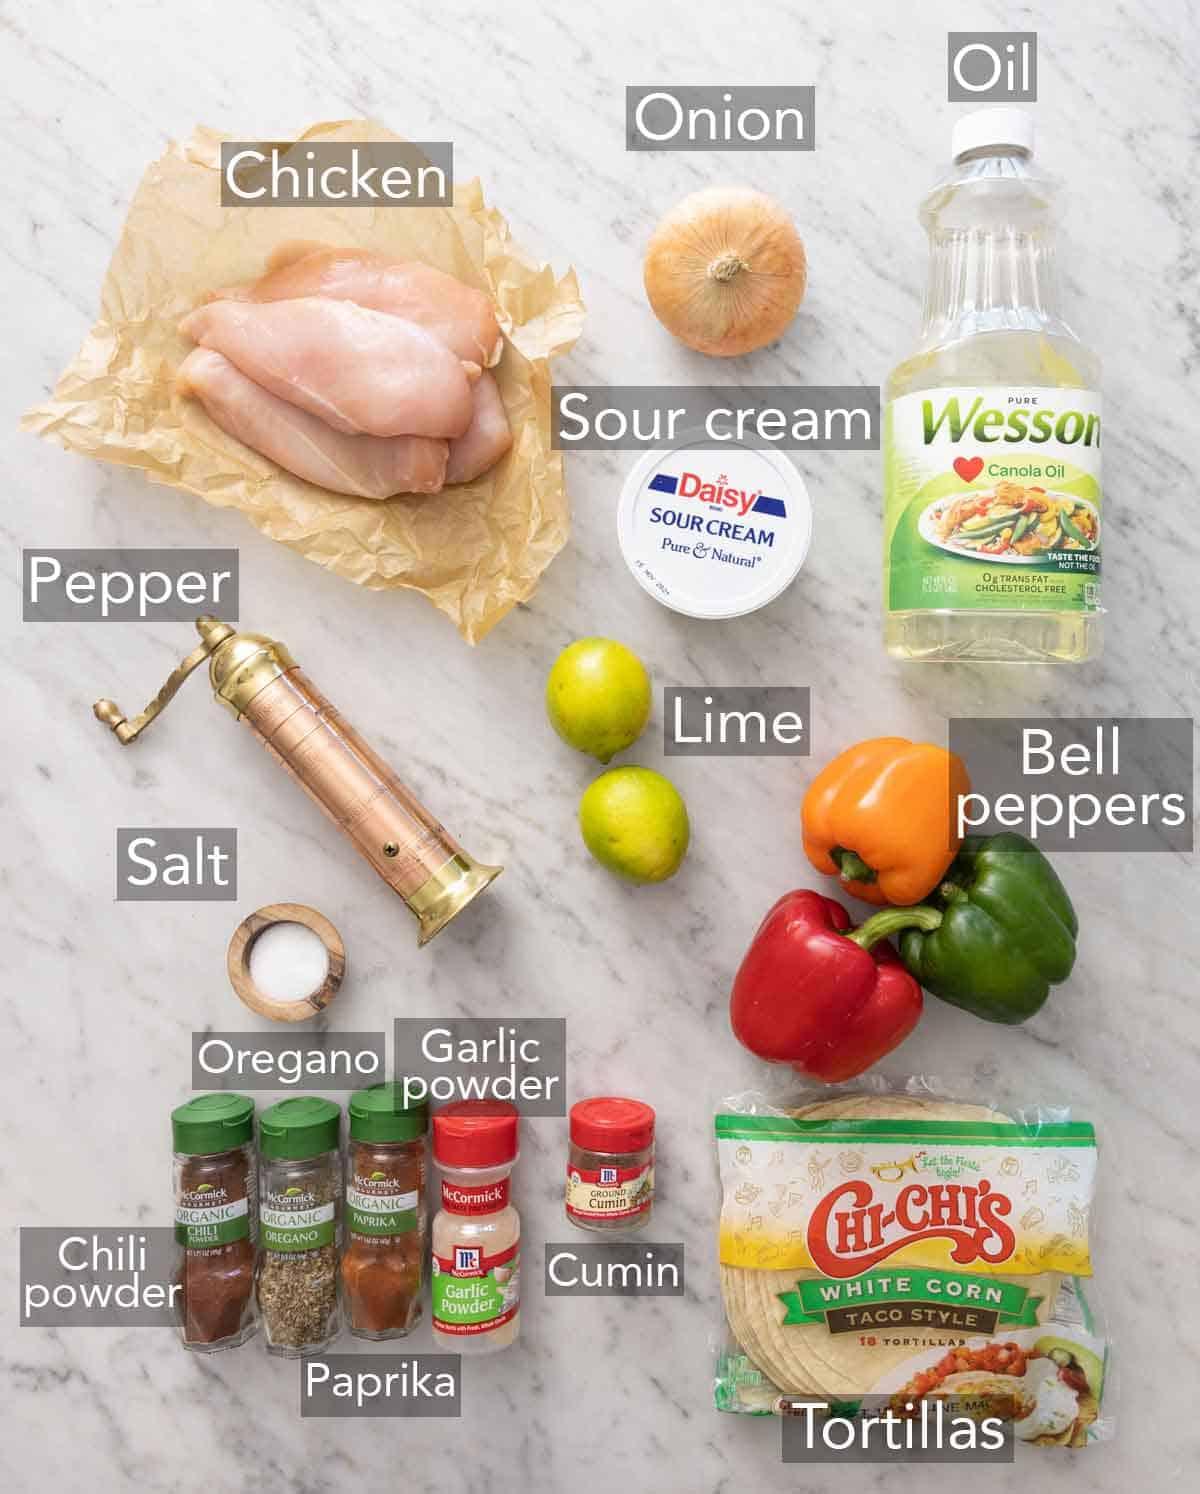 Ingredients needed to make chicken fajitas.